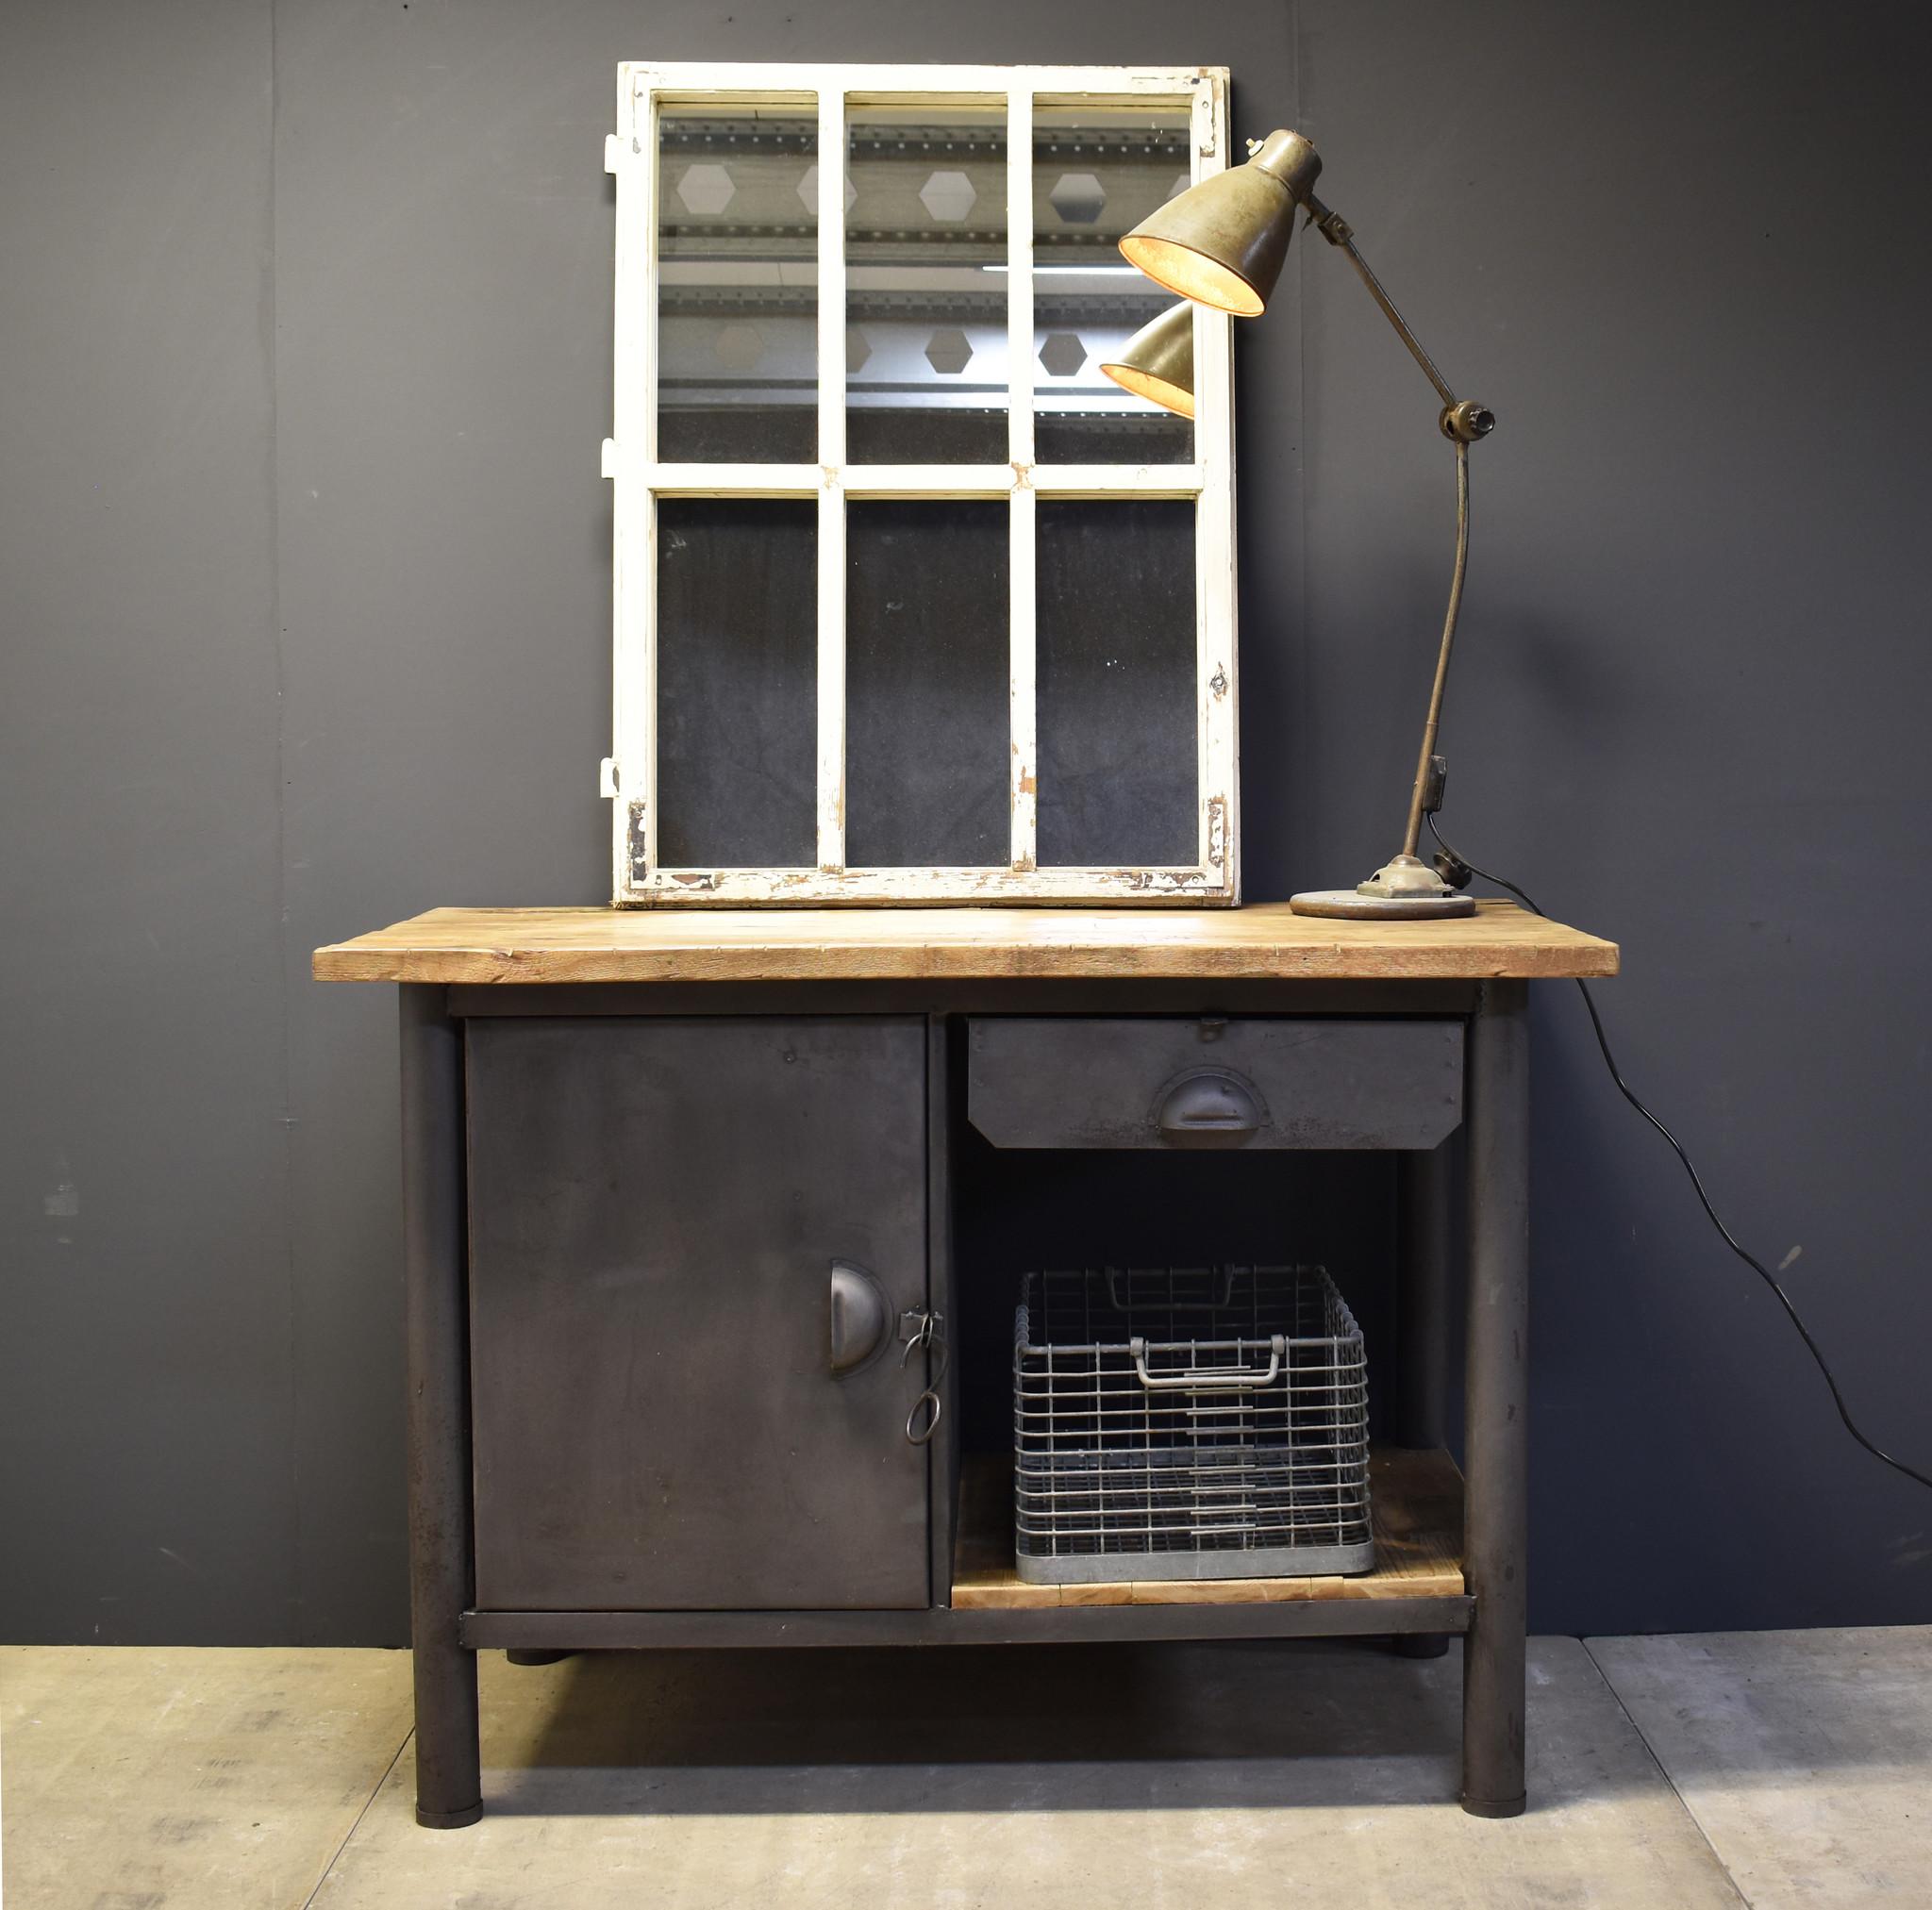 Industriële werkbank - Stoer dressoir